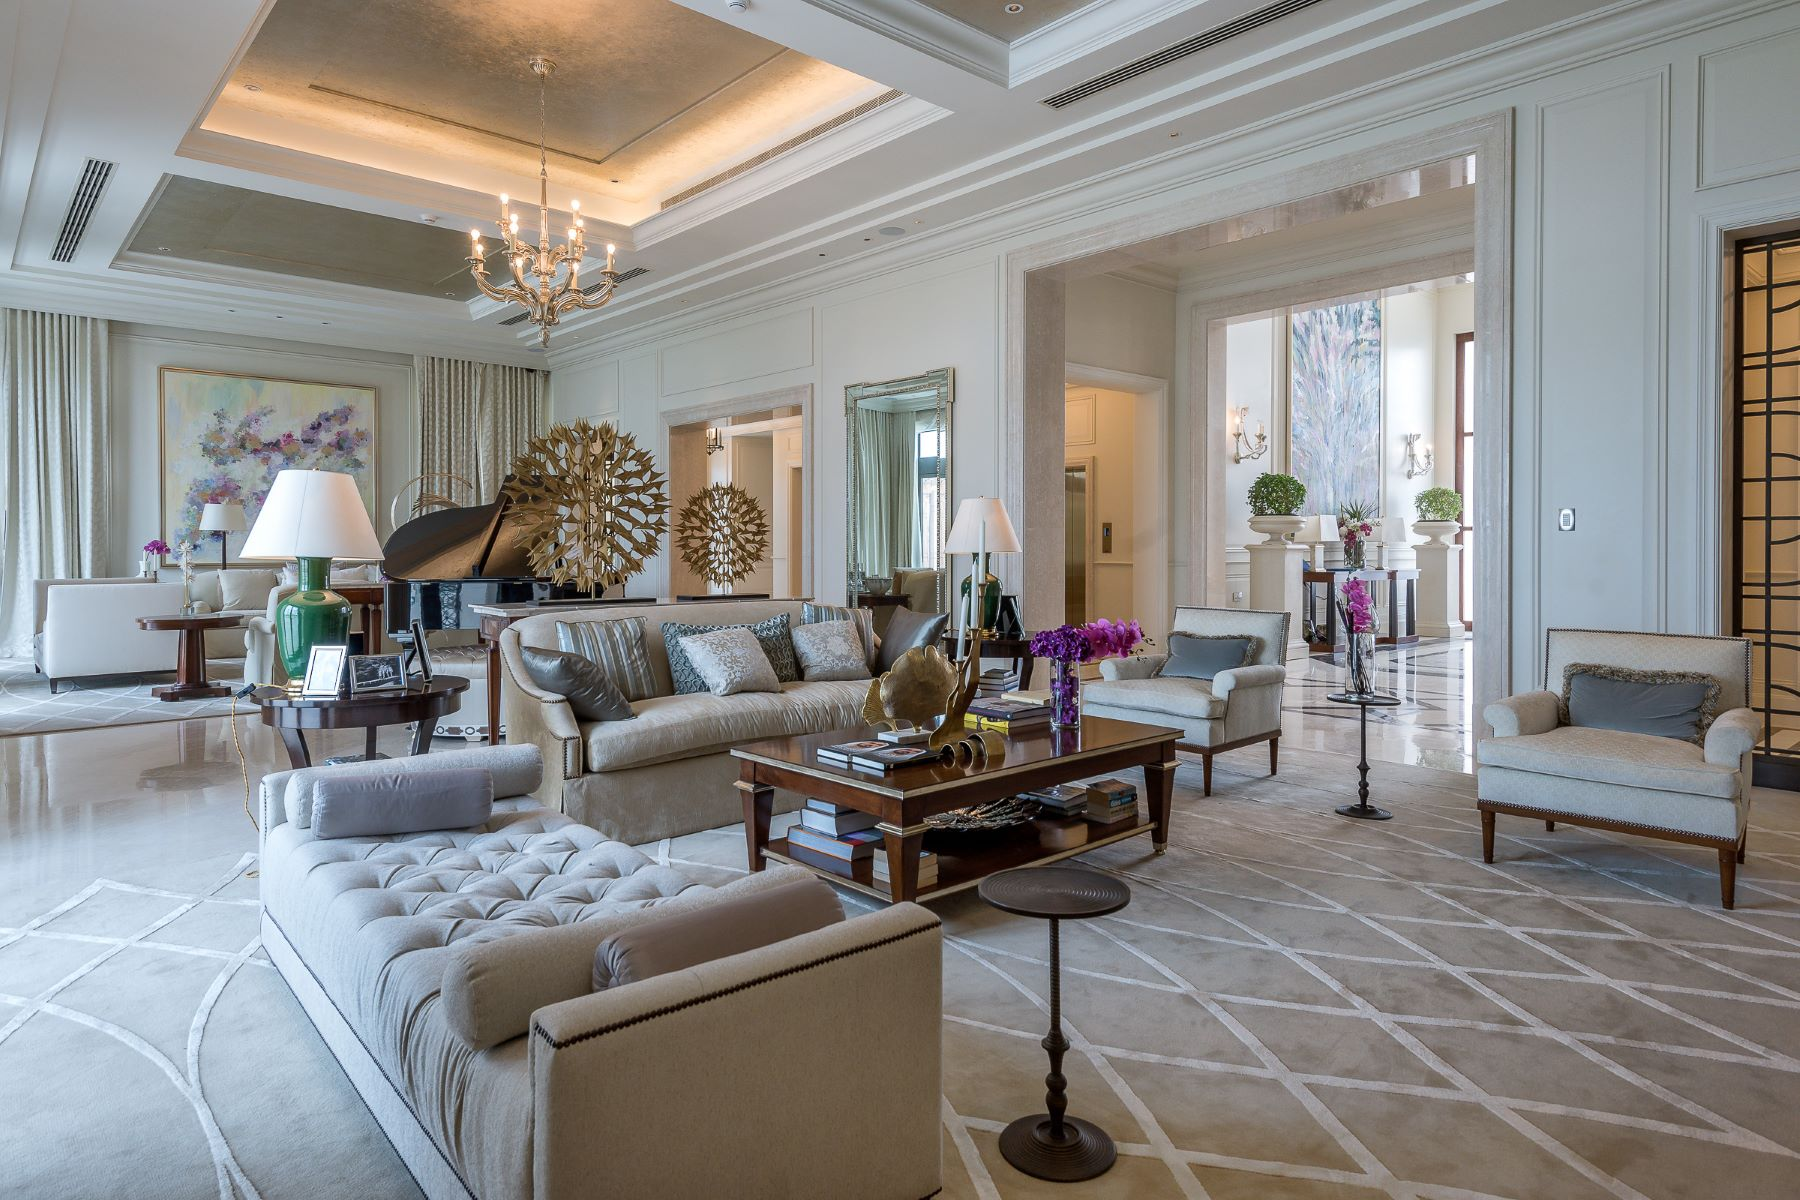 Single Family Home for Sale at Contemporary Arabesque Mansion Dubai, United Arab Emirates